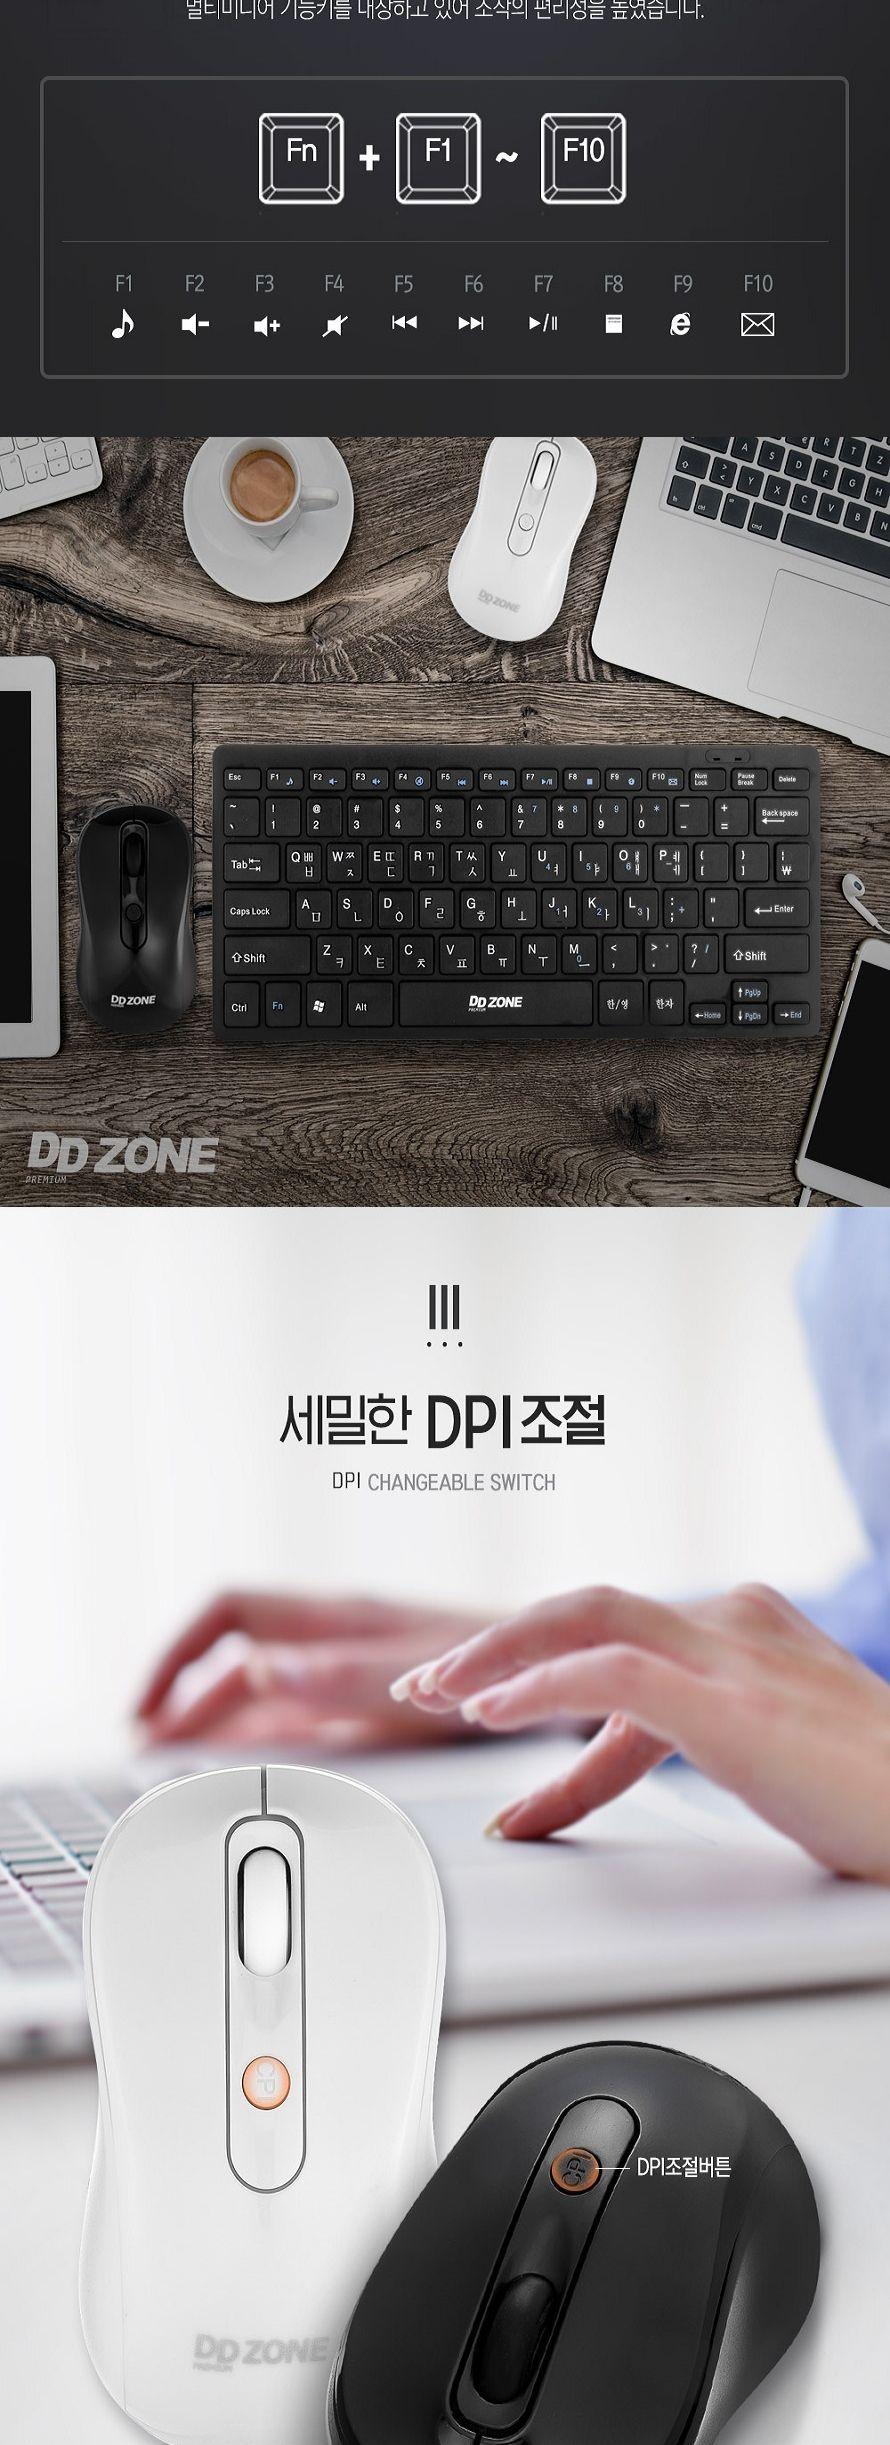 DDZONE DMK-900M 블랙 무선 미니세트 무선키보드마우 무선키보드마우스 블랙무선키보드 나노리시버무선키보드 마우스키보드세트 멤브레인무선키보드